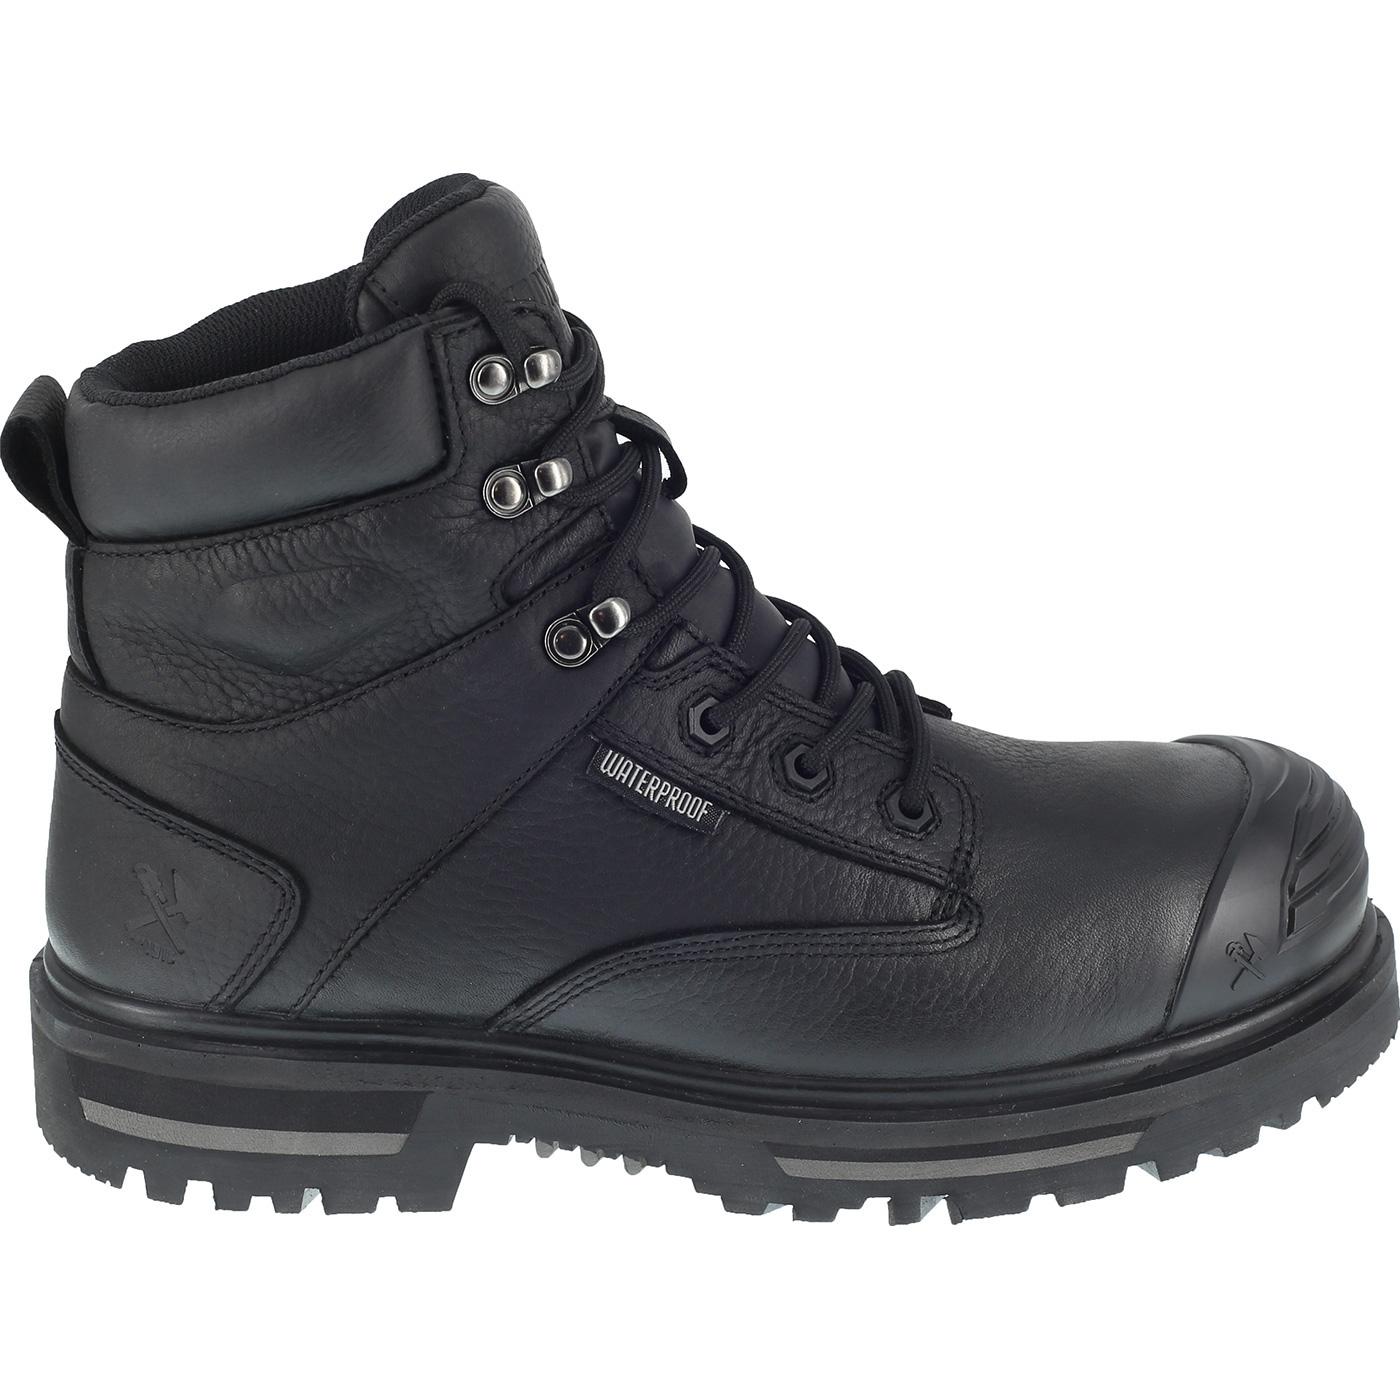 b82b950331f Iron Age Troweler Men's Composite Toe Waterproof Work Boot